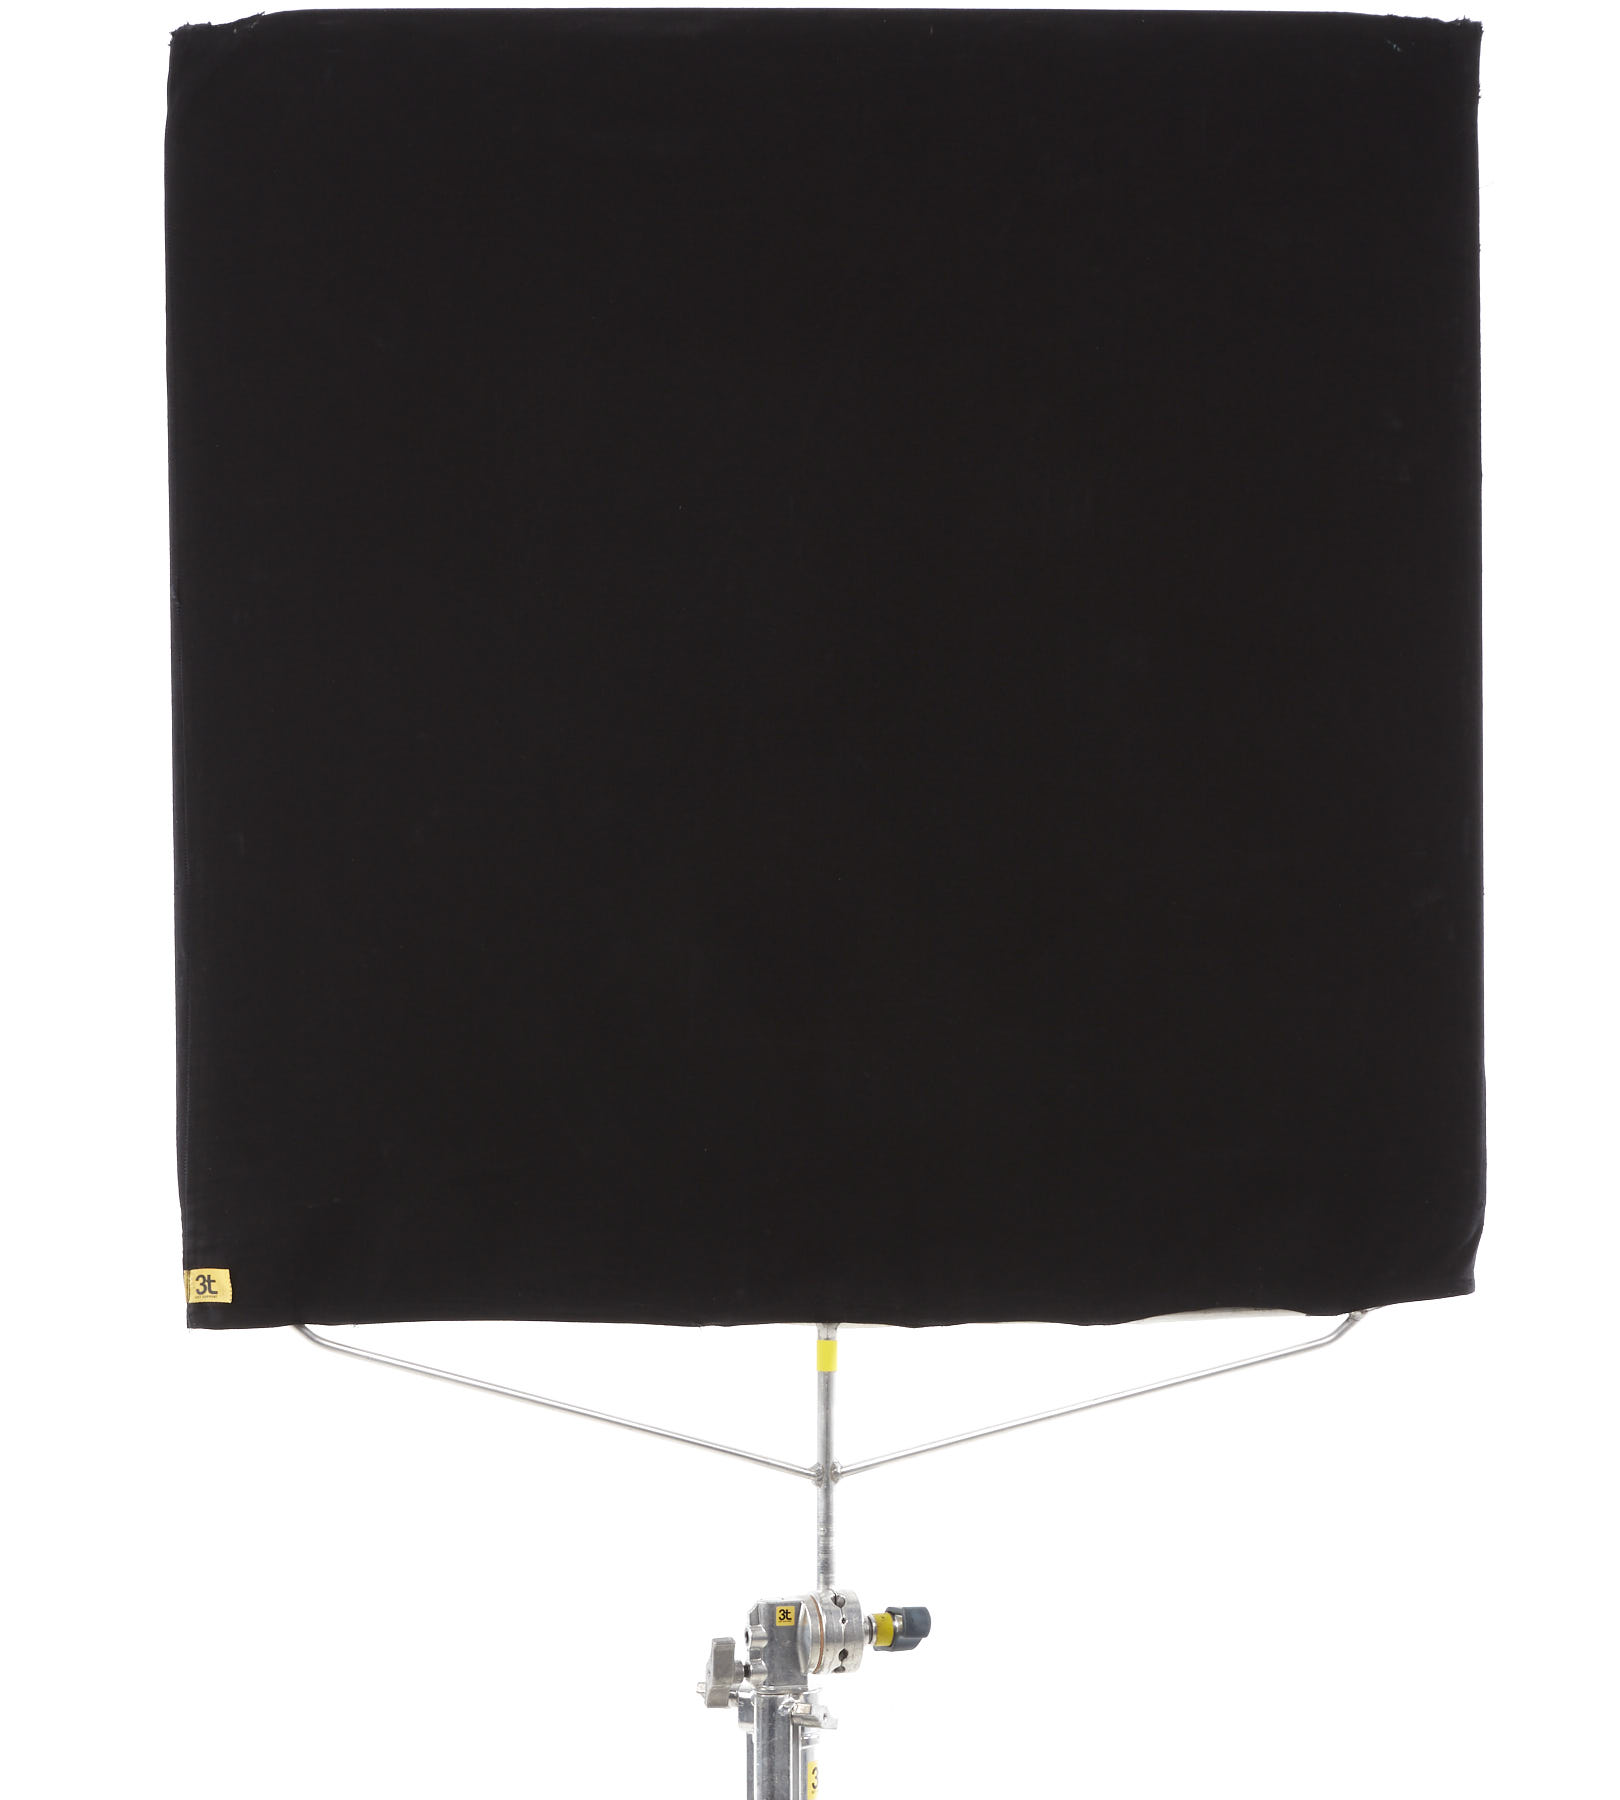 Bandeira preta 1x1m com difusor terkron